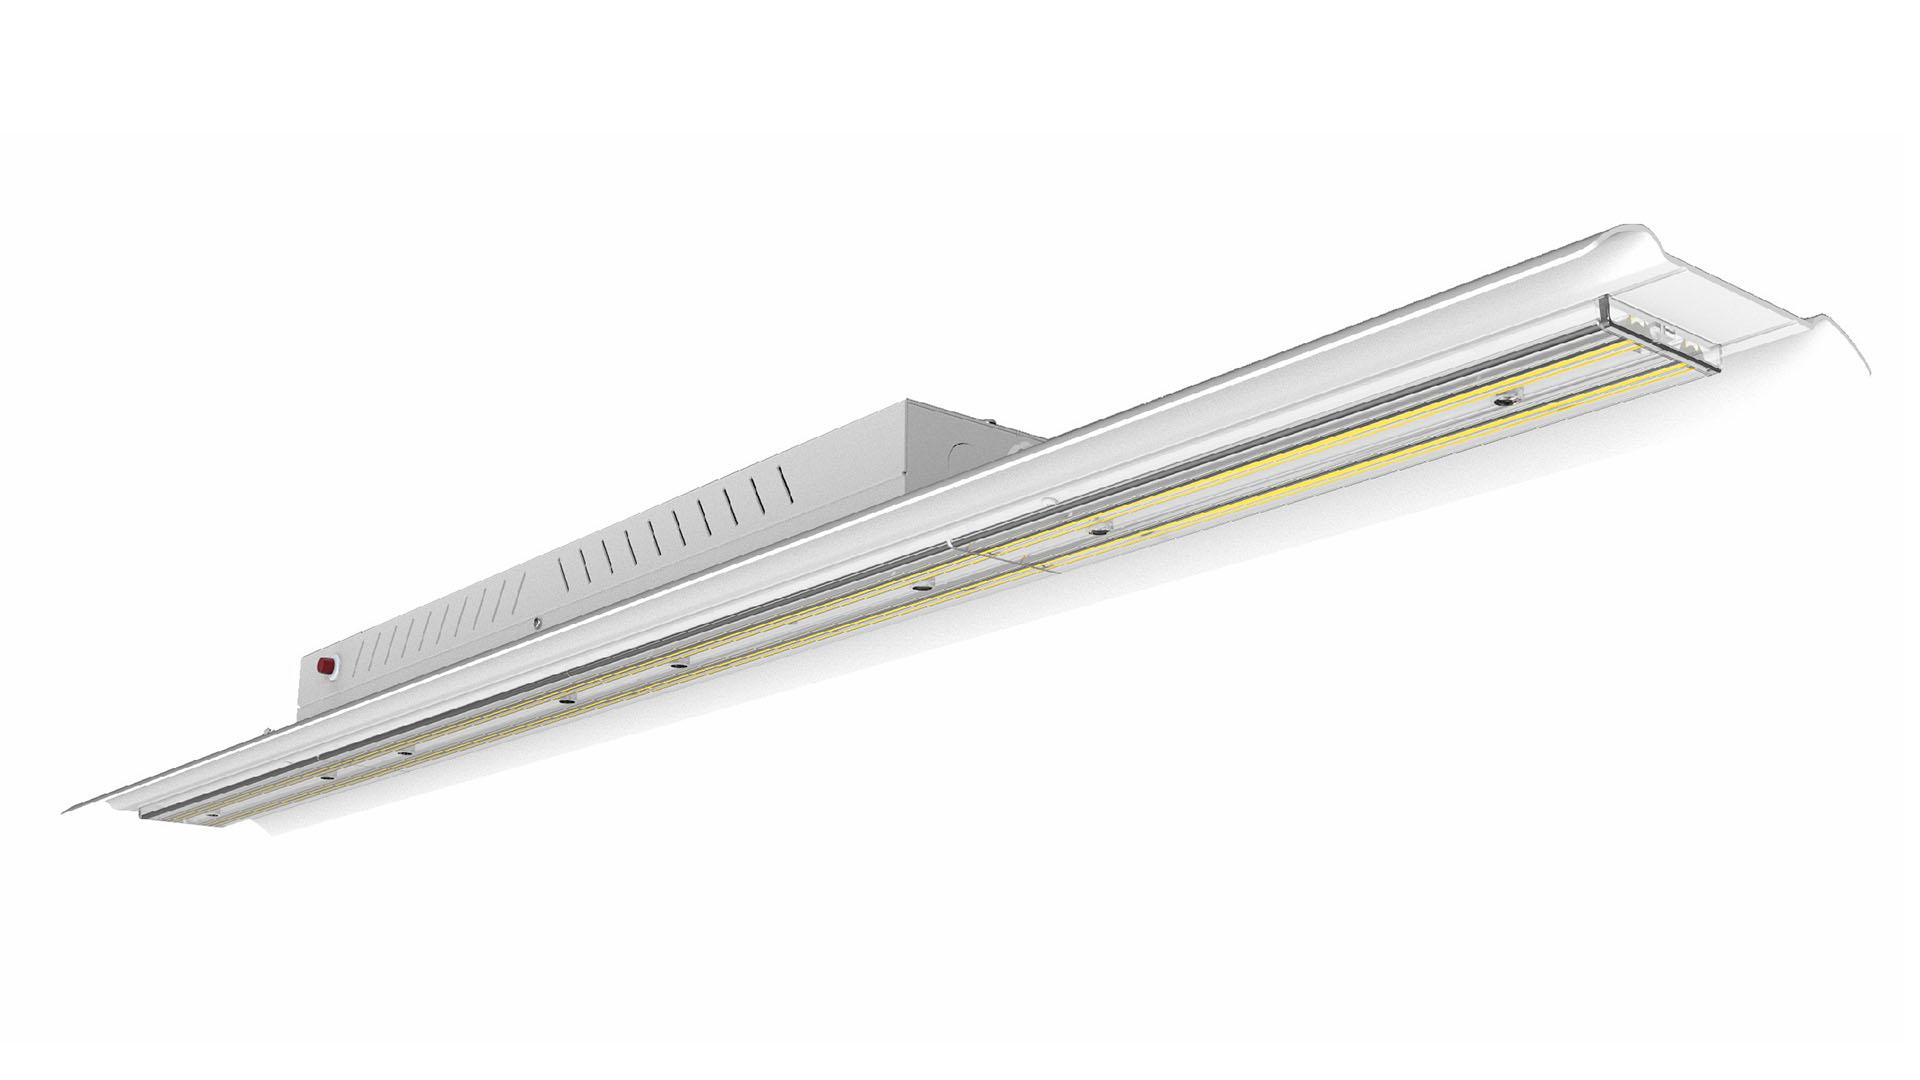 He Maama Linear High Bay Light-C